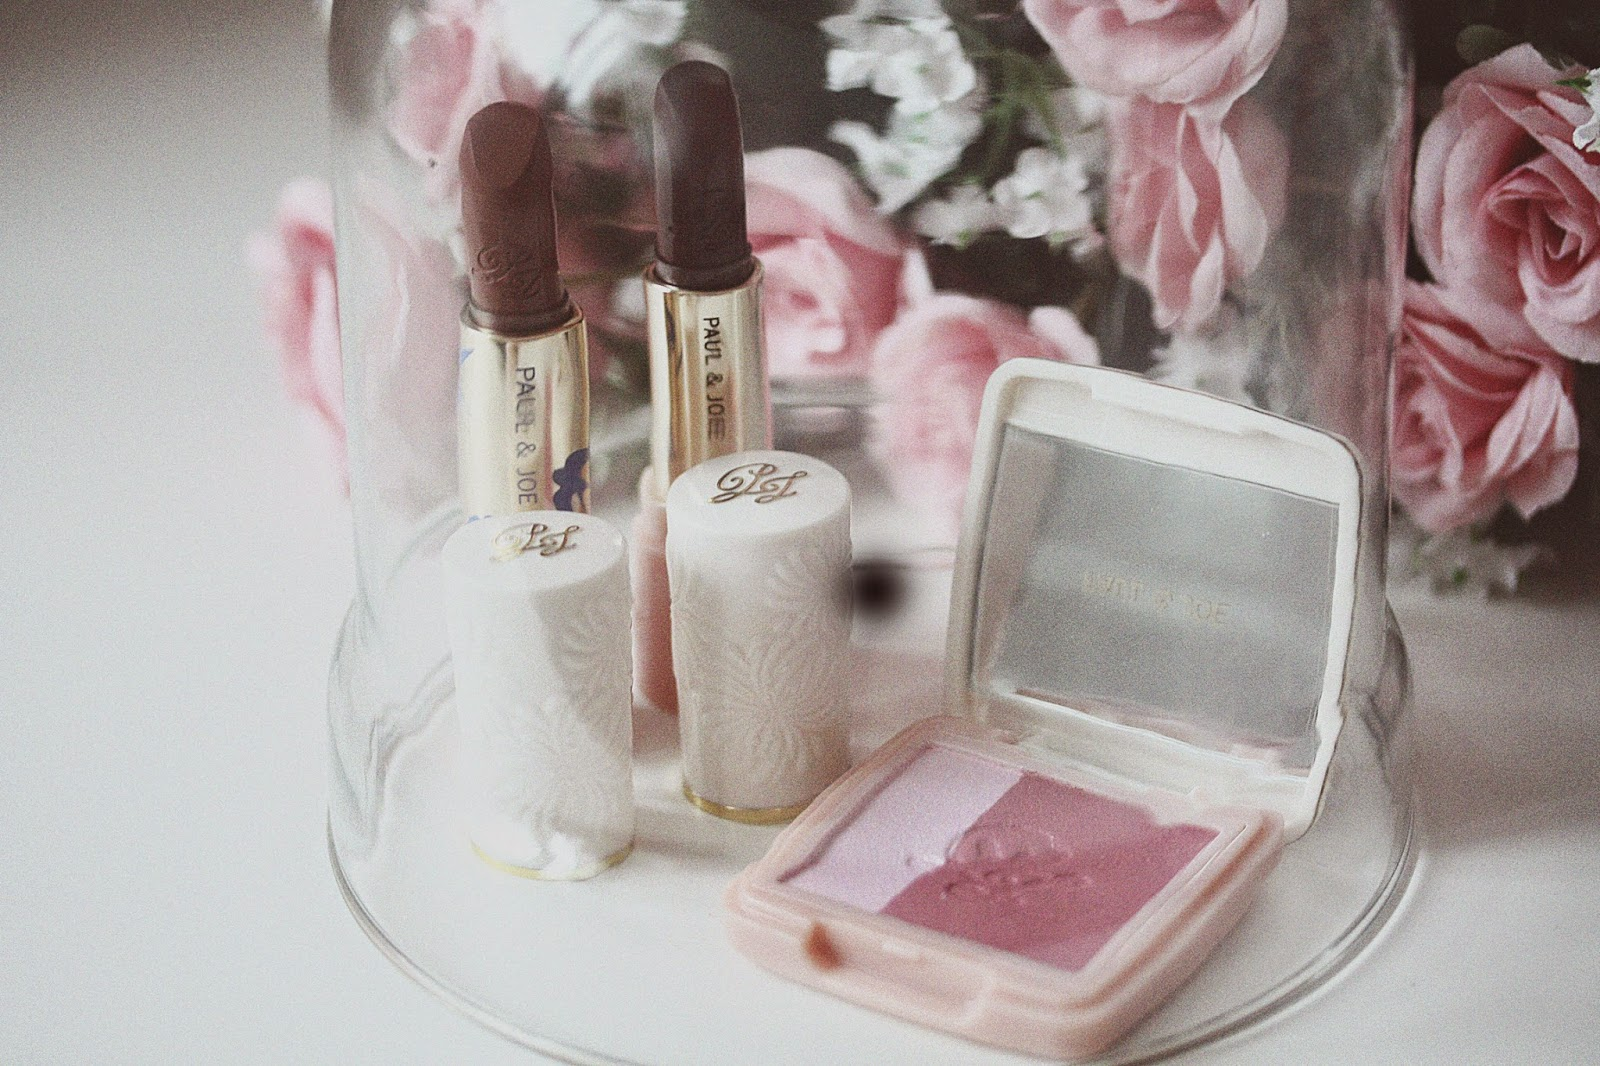 http://www.rosemademoiselle.com/2015/03/paul-joe-beaute.html